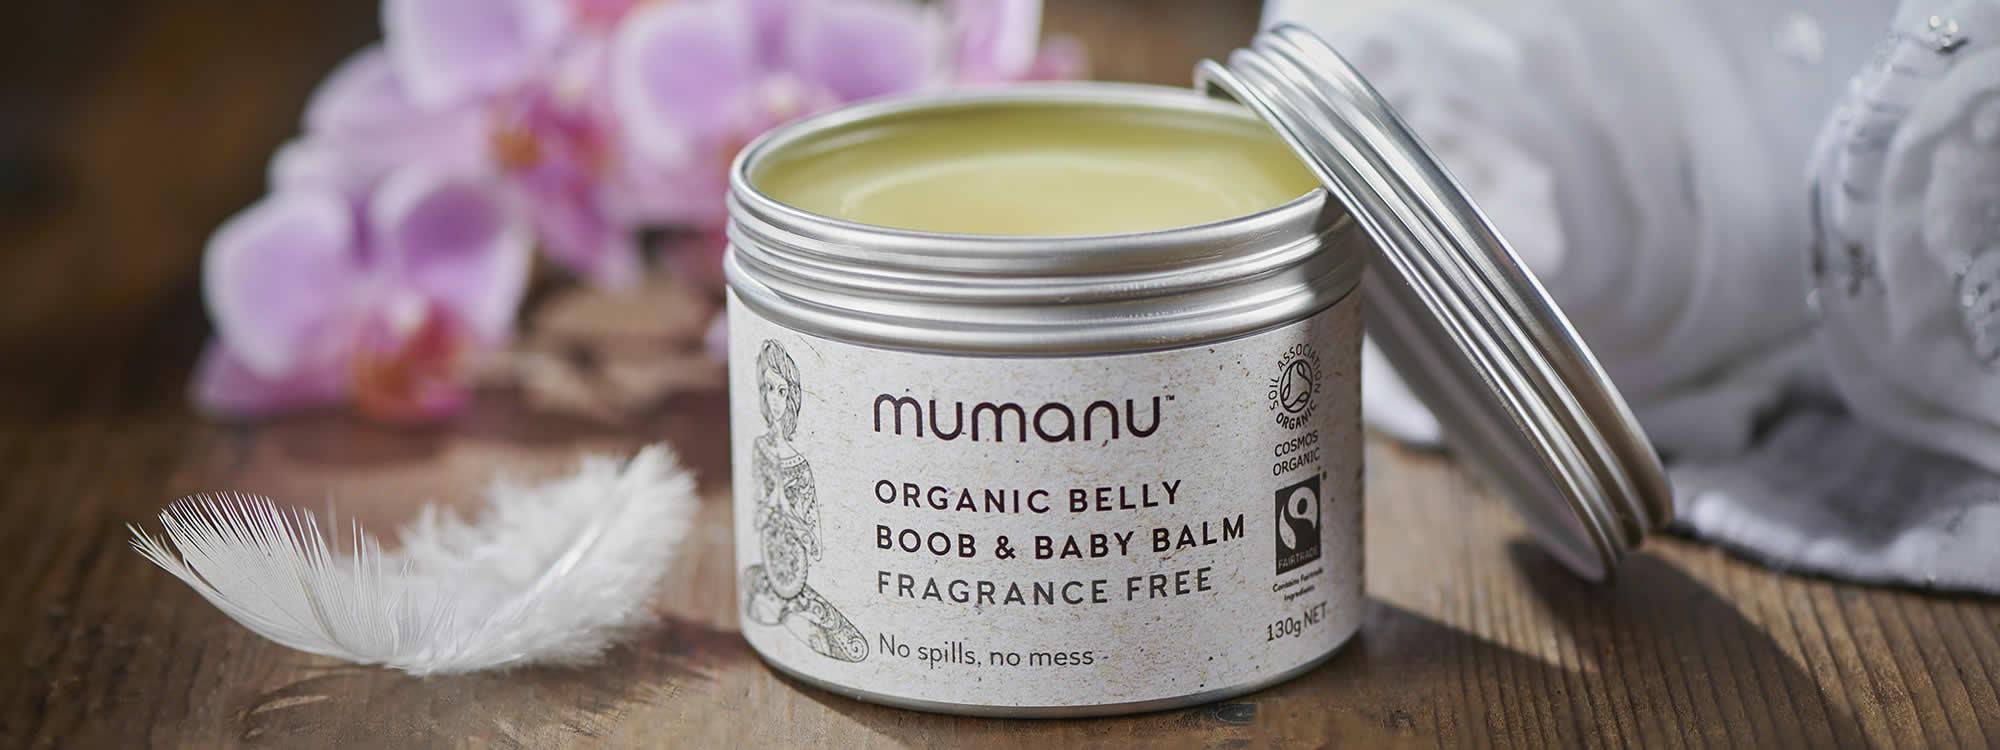 Mumanu Organic Belly, Boob & Baby Balm - Nappy Rash Cream - Cradle Cap Cream - Stretchmark Oil